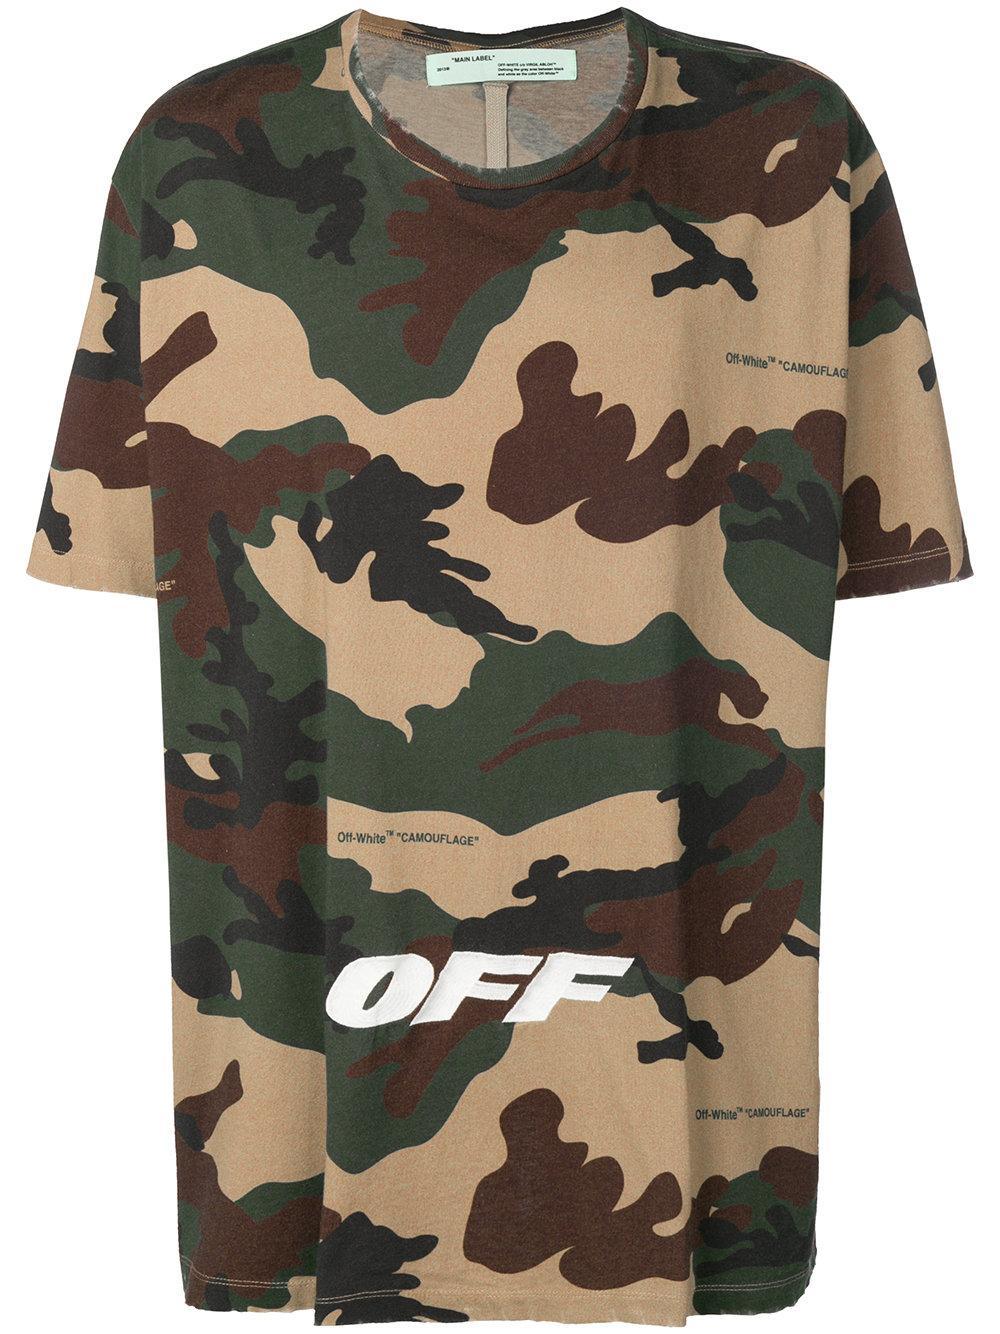 ddedd7d4c9d1 Off-White Logo Camouflage Cotton Oversized T-Shirt - Beige